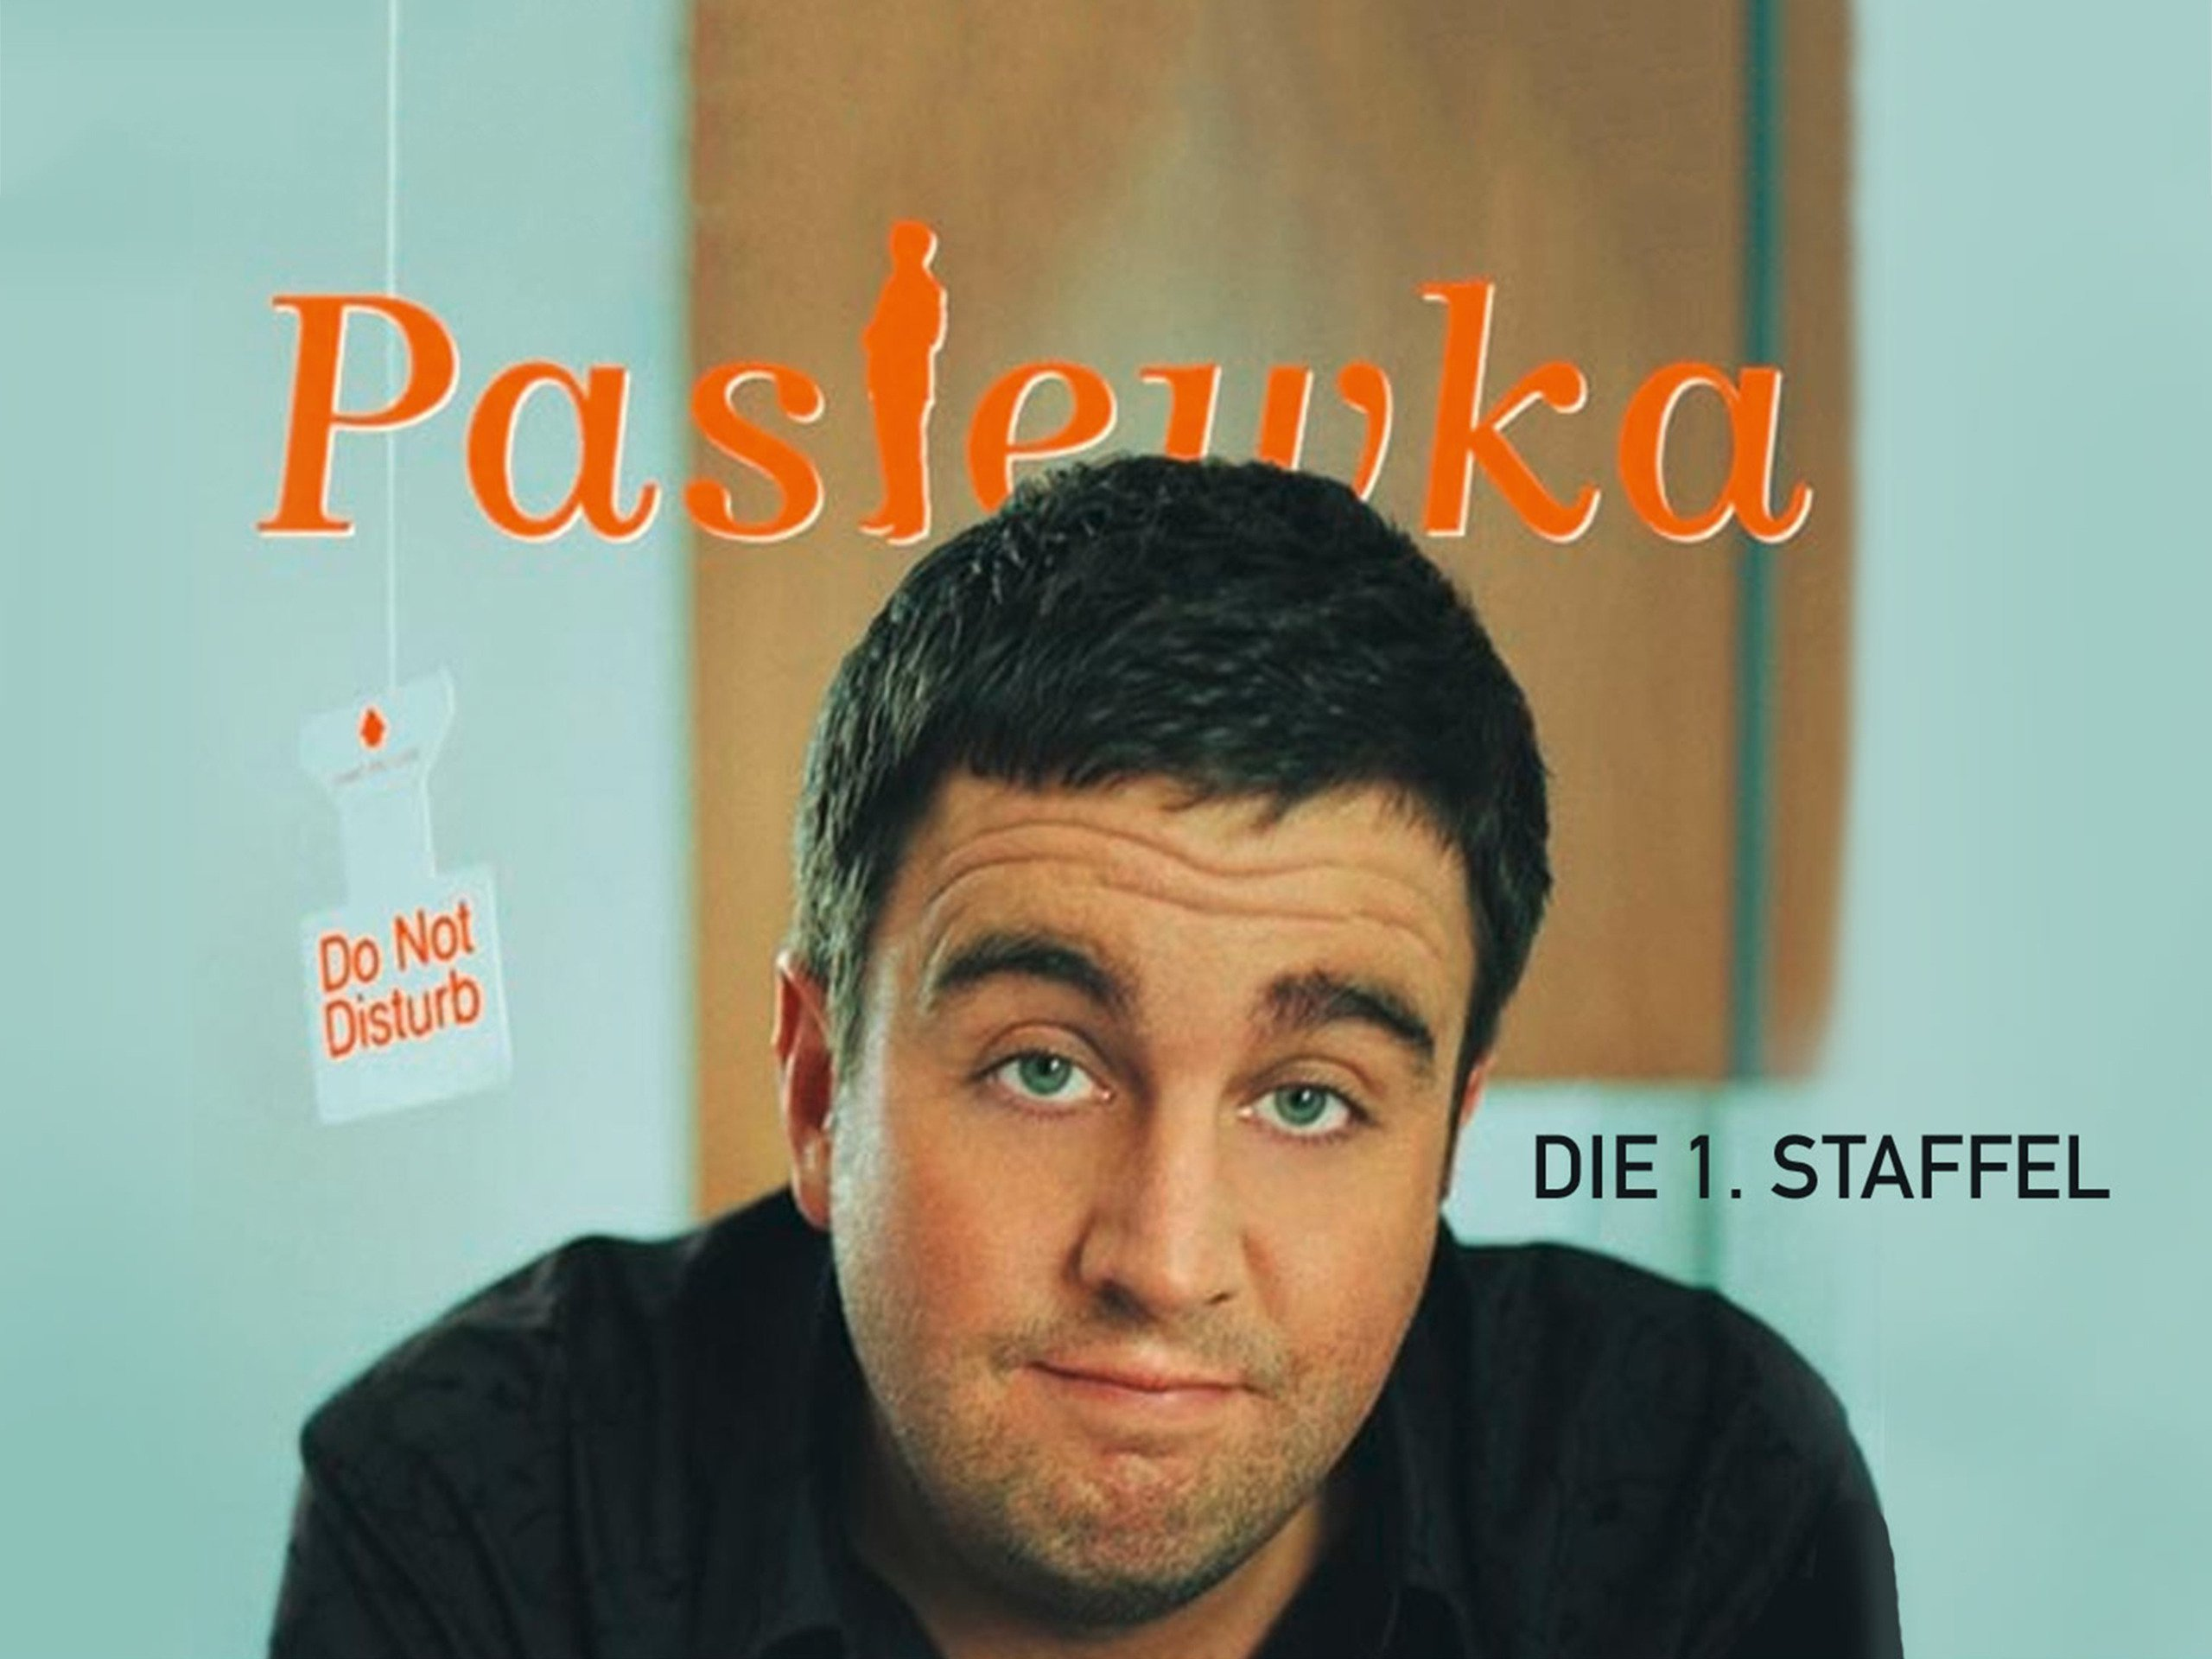 Amazonde Pastewka Staffel 1 Ansehen Prime Video